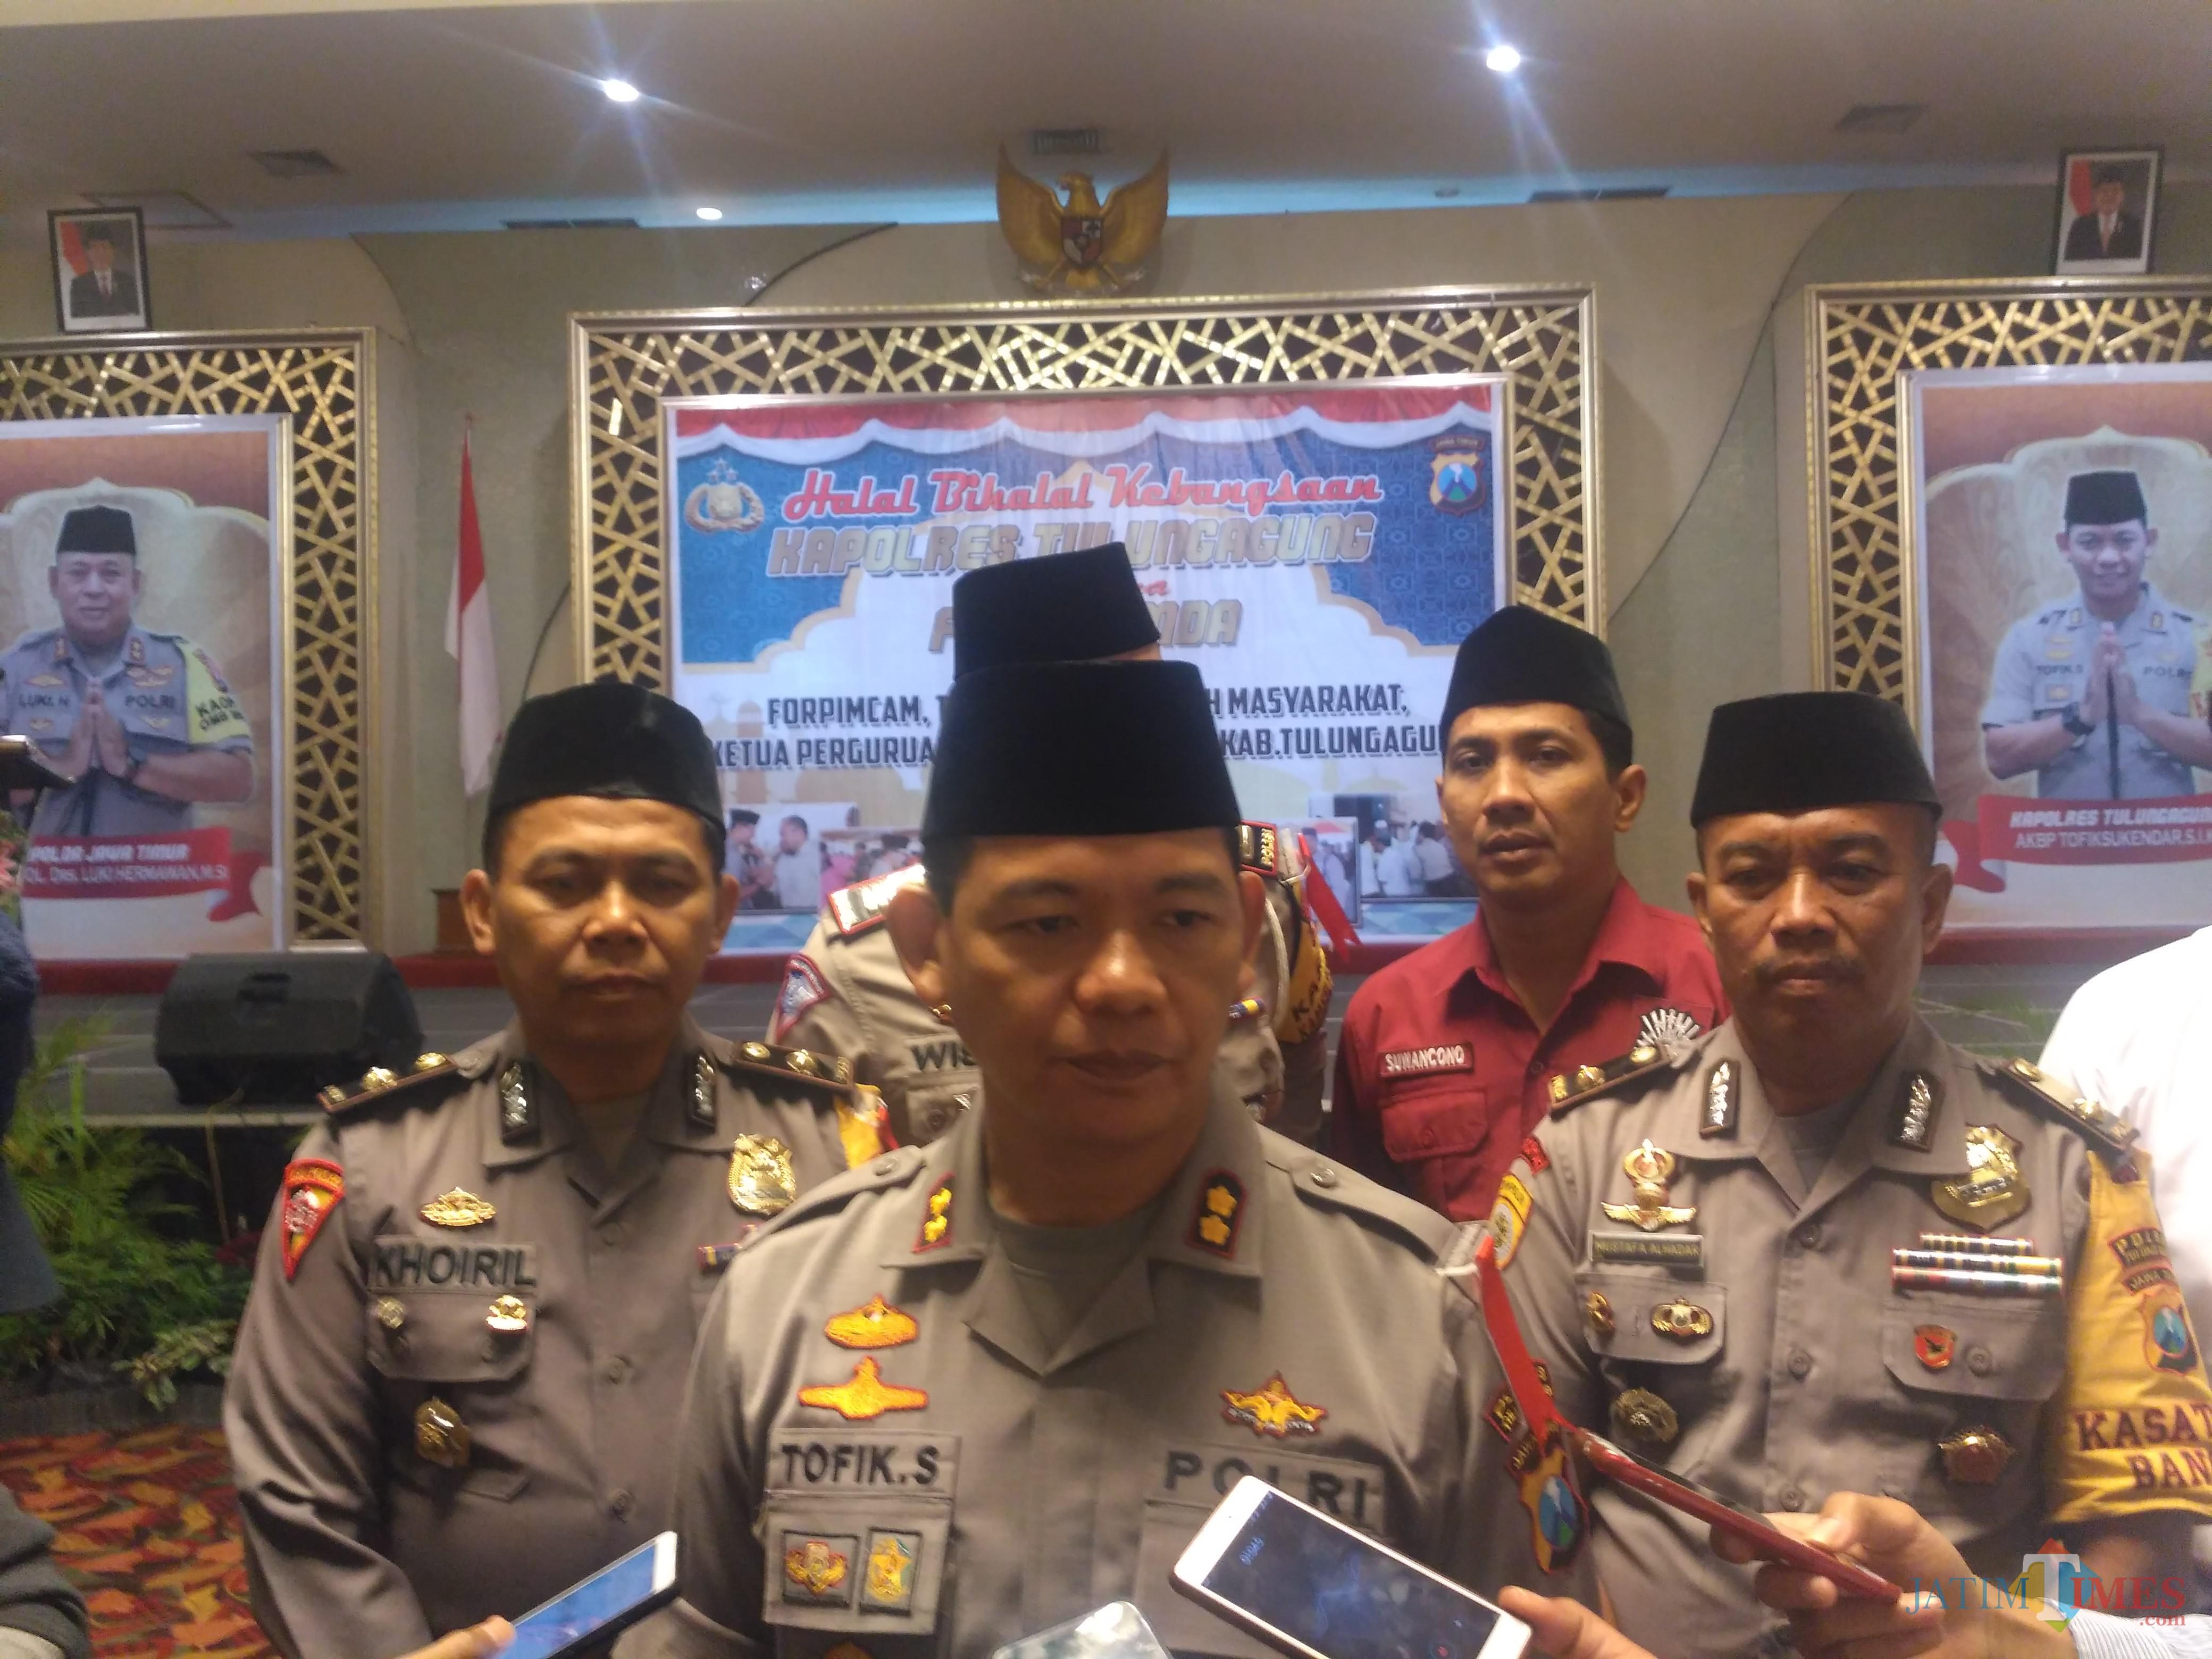 Kapolres Tulungagung AKBP Tofik Sukendar di Hotel Istana, Selasa (25/06/2019). / Foto : Anang Basso / Tulungagung TIMES